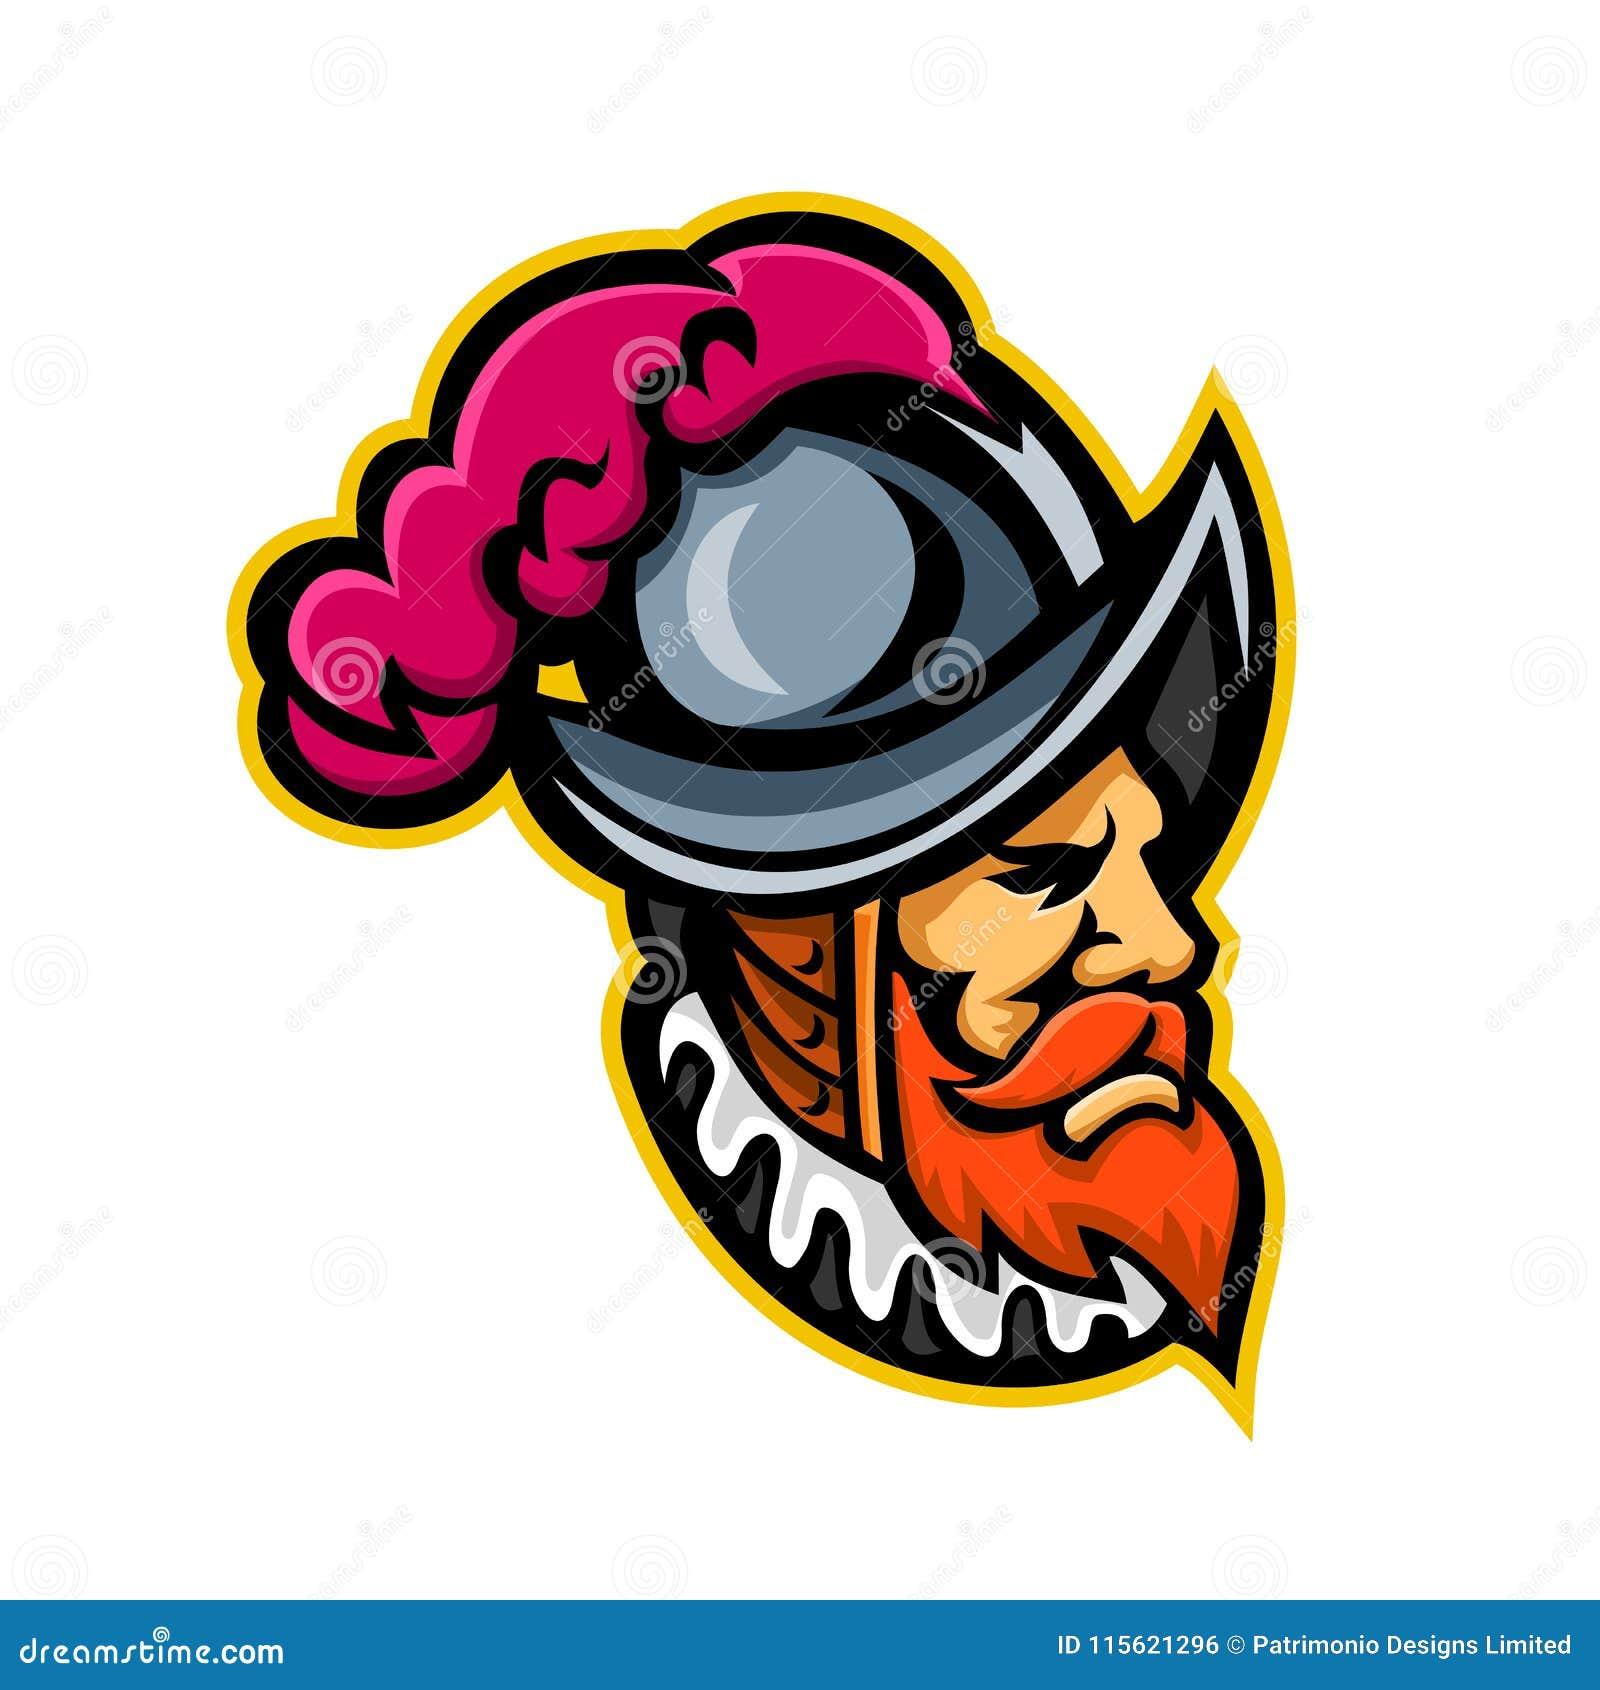 Spanish Conquistador Head Mascot